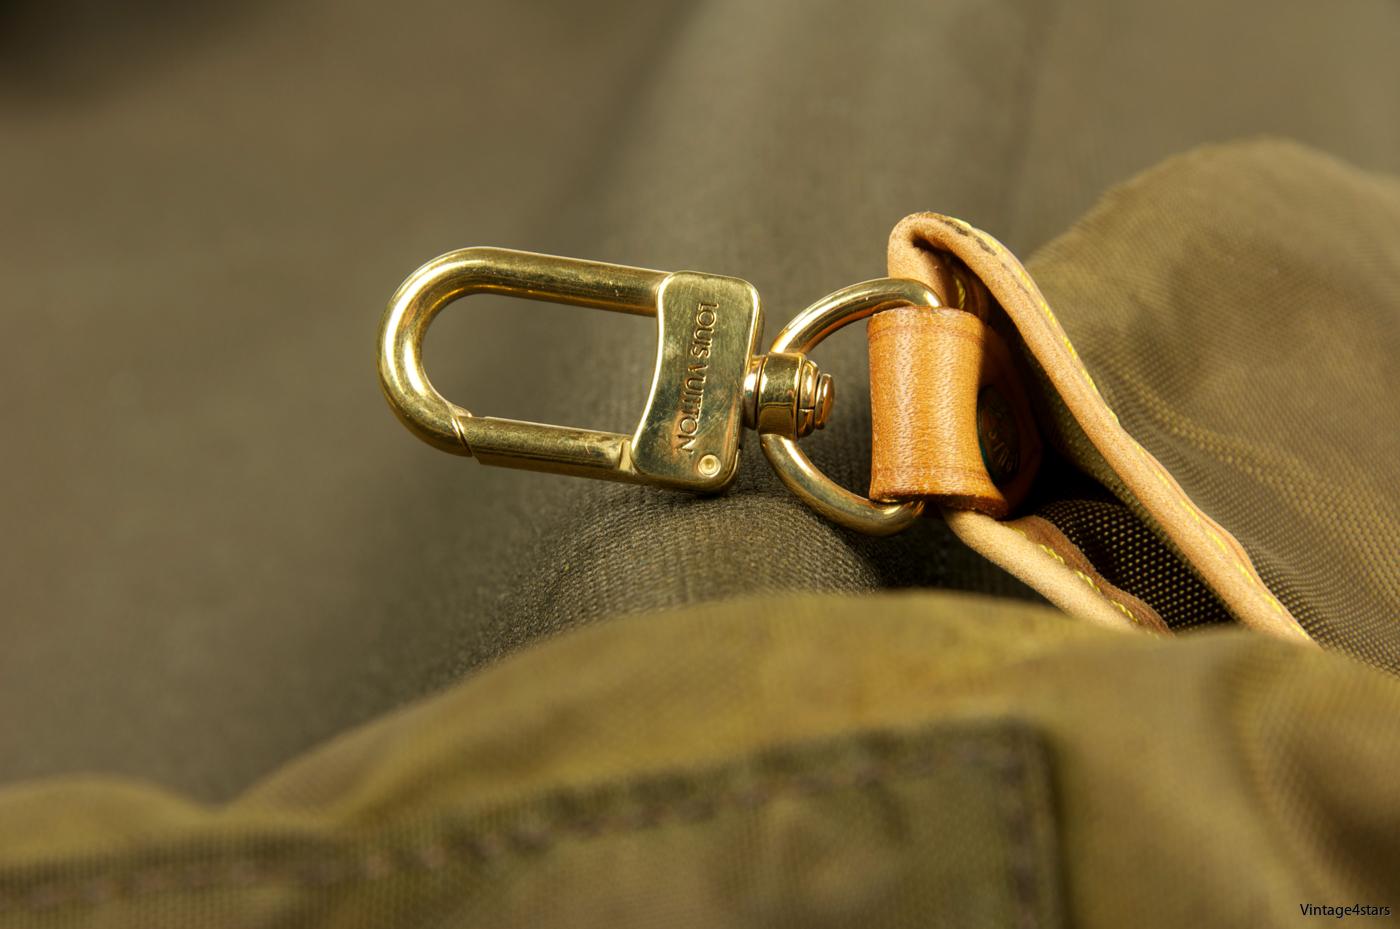 Louis Vuitton Garment Bag 3 Hangers 19